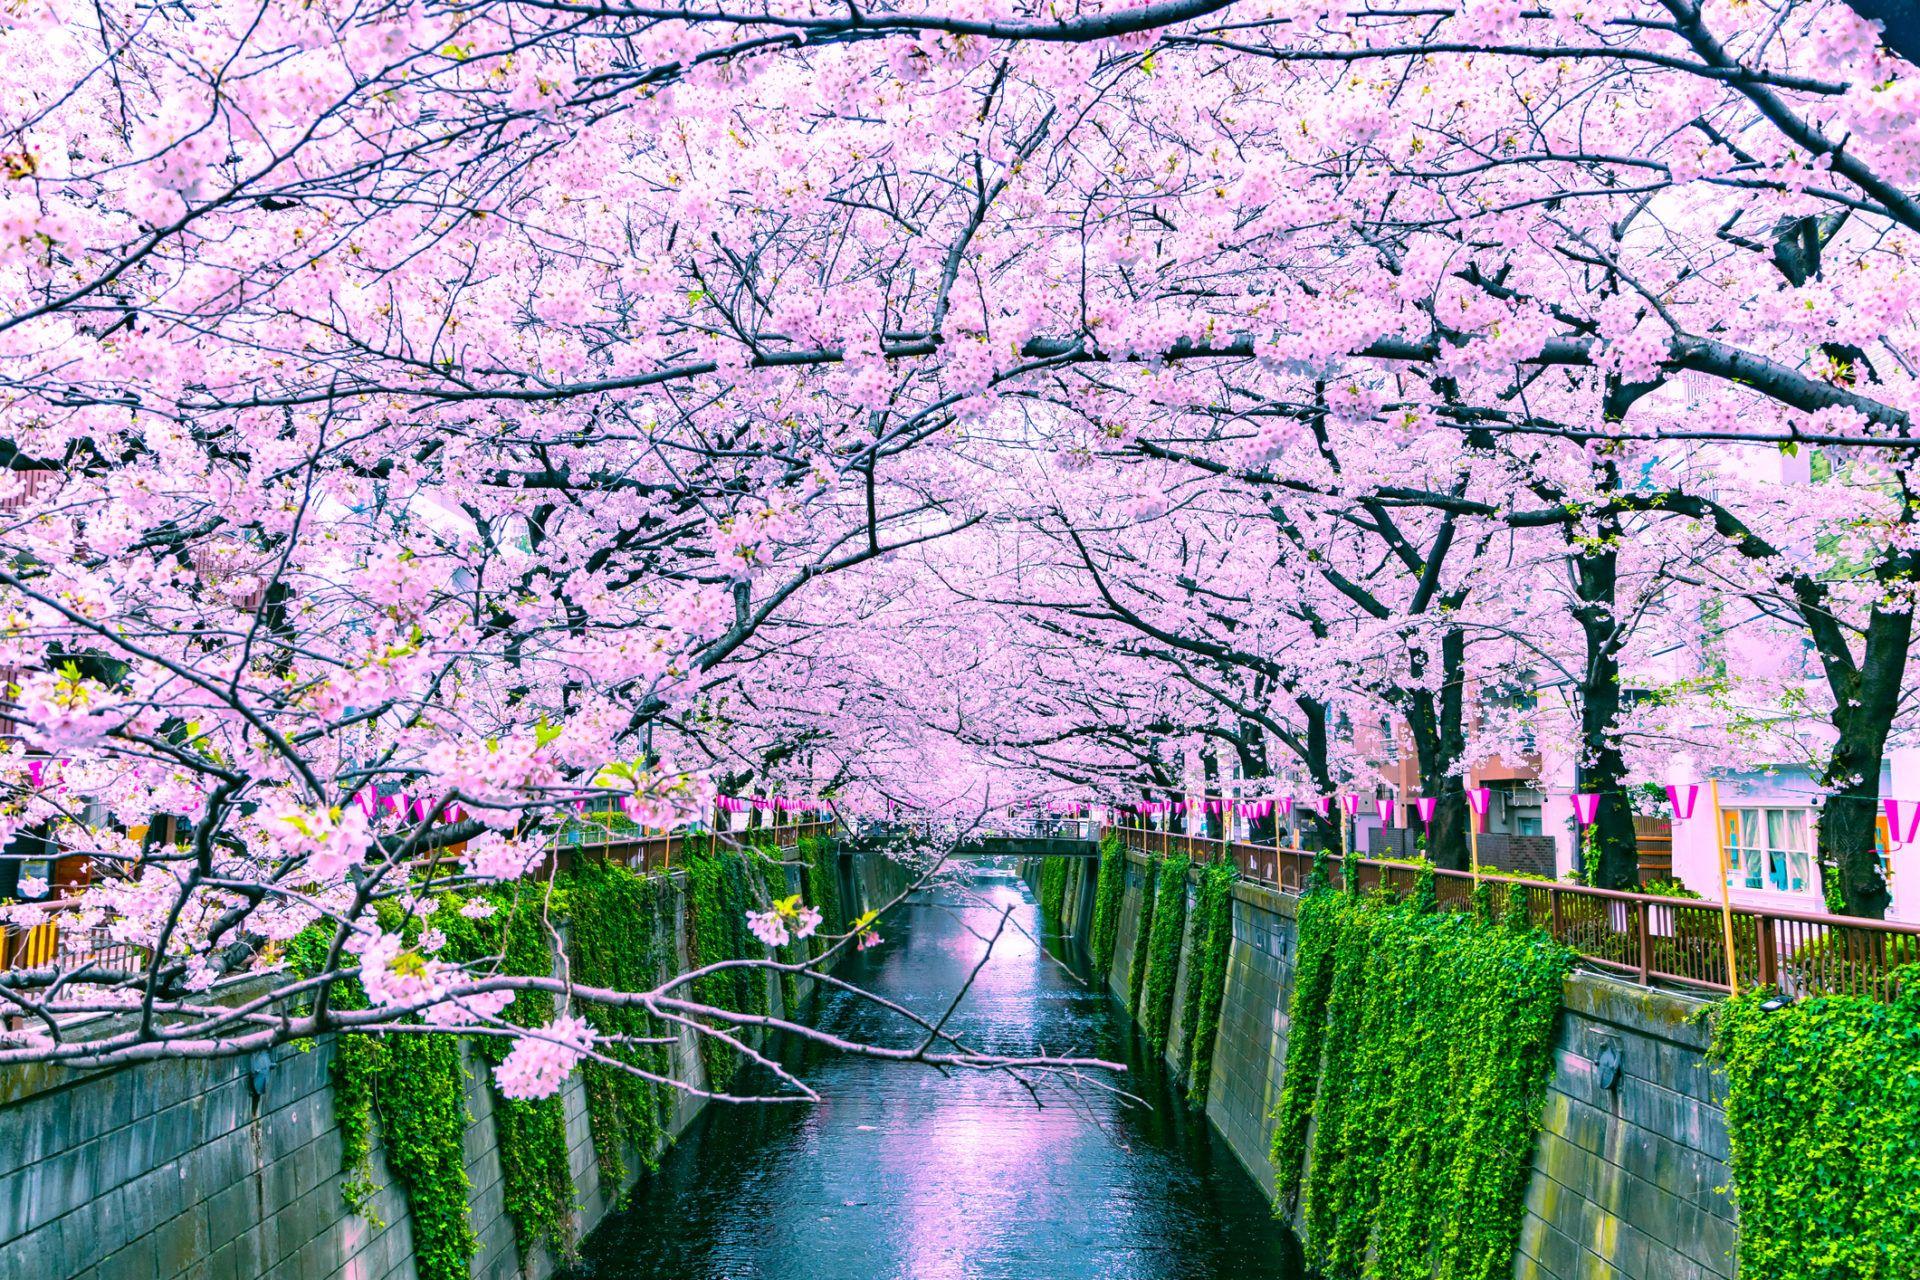 Cherry Blossom Sakura 2018 Japan Forecast When Where To Visit Blossom Cherry Cherryblossom Forecast Japan S Japan Travel Tips Japan Japan Holidays